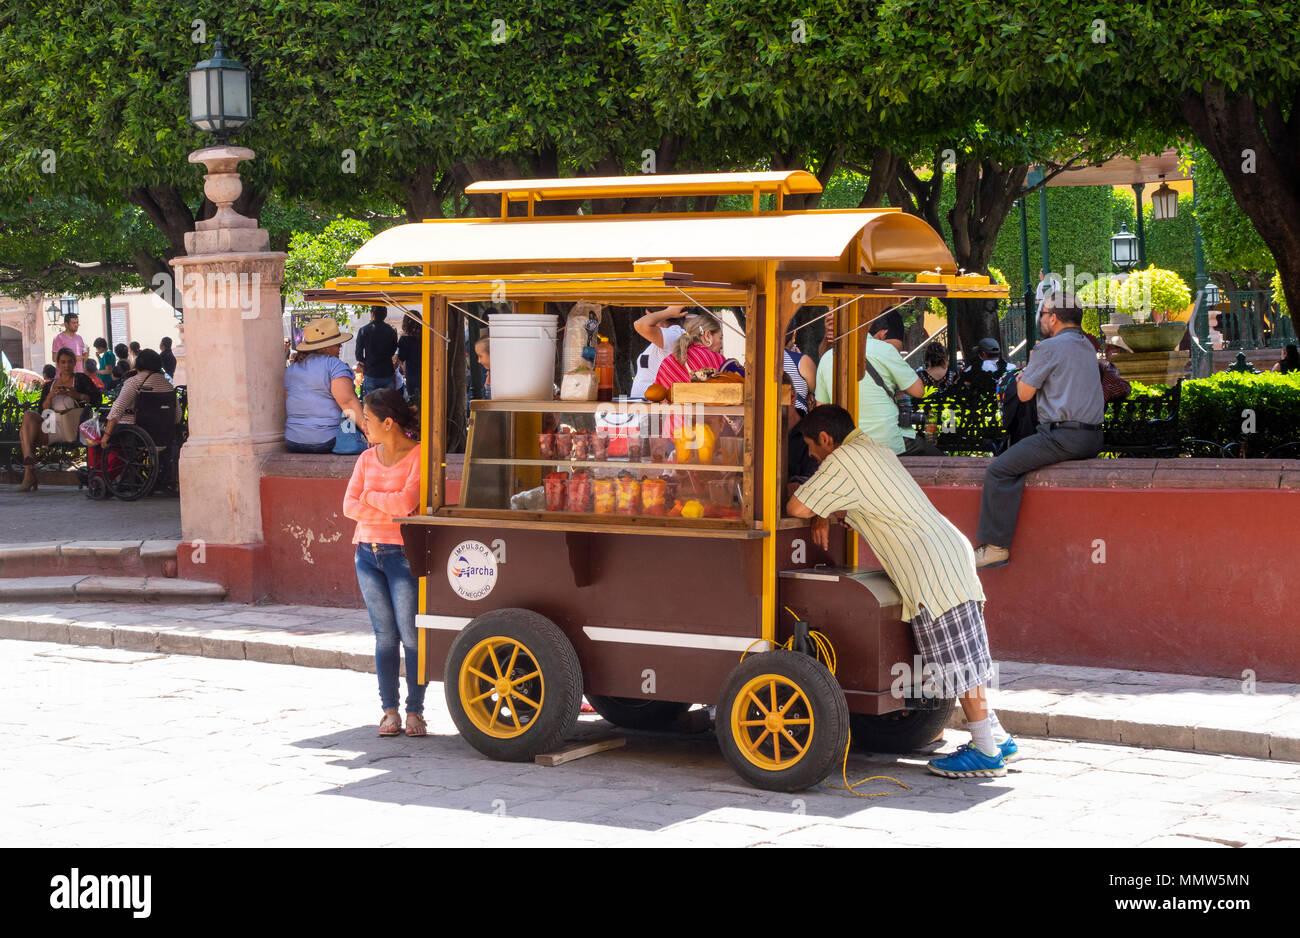 A snack food stand in the Jardin Principal in San Miguel de Allende - Stock Image